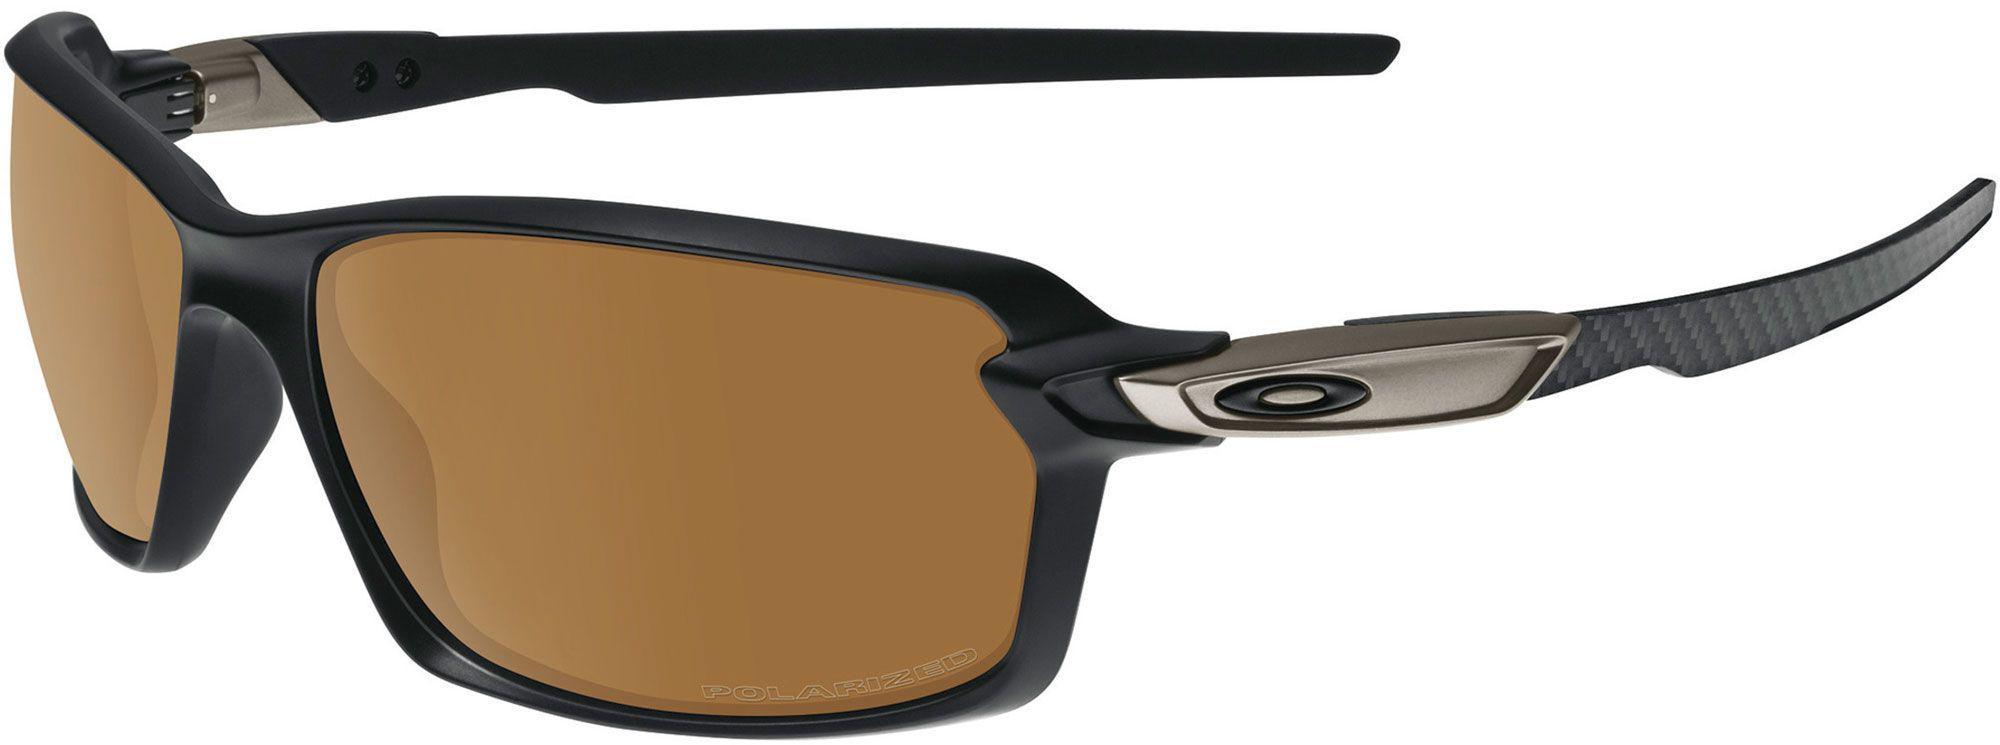 687b1f1bde ... australia usa oakley. mens black carbon shift polarized sunglasses  74b26 d9b5b 4b687 fb3ba